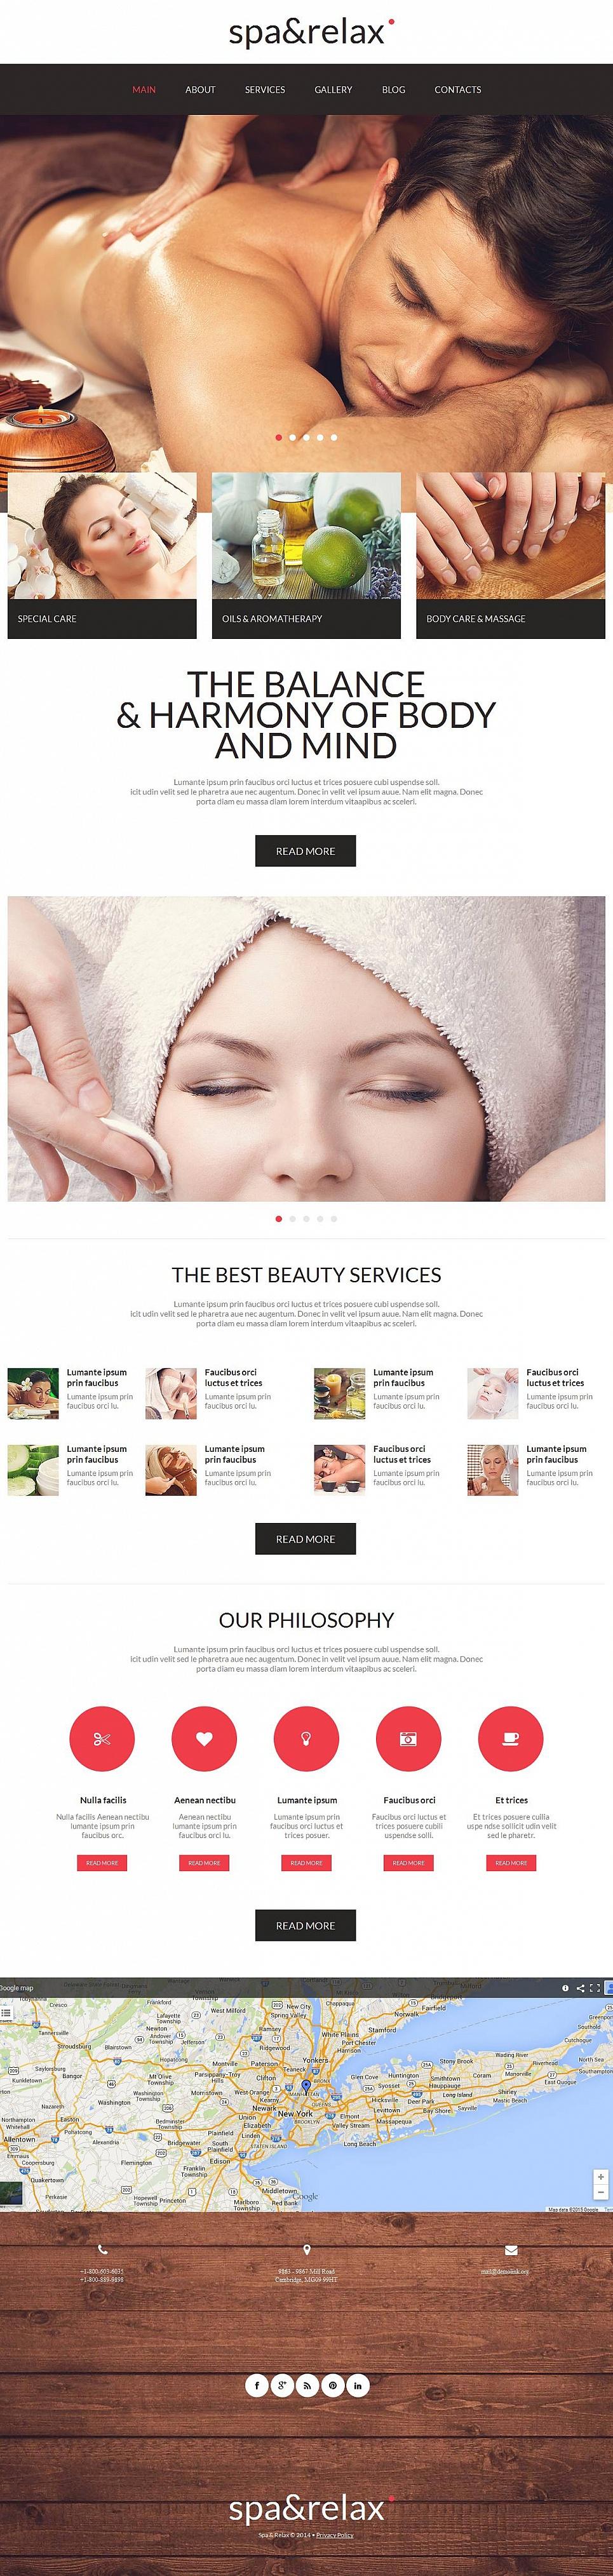 Complete Website Design for Beauty Salon - image